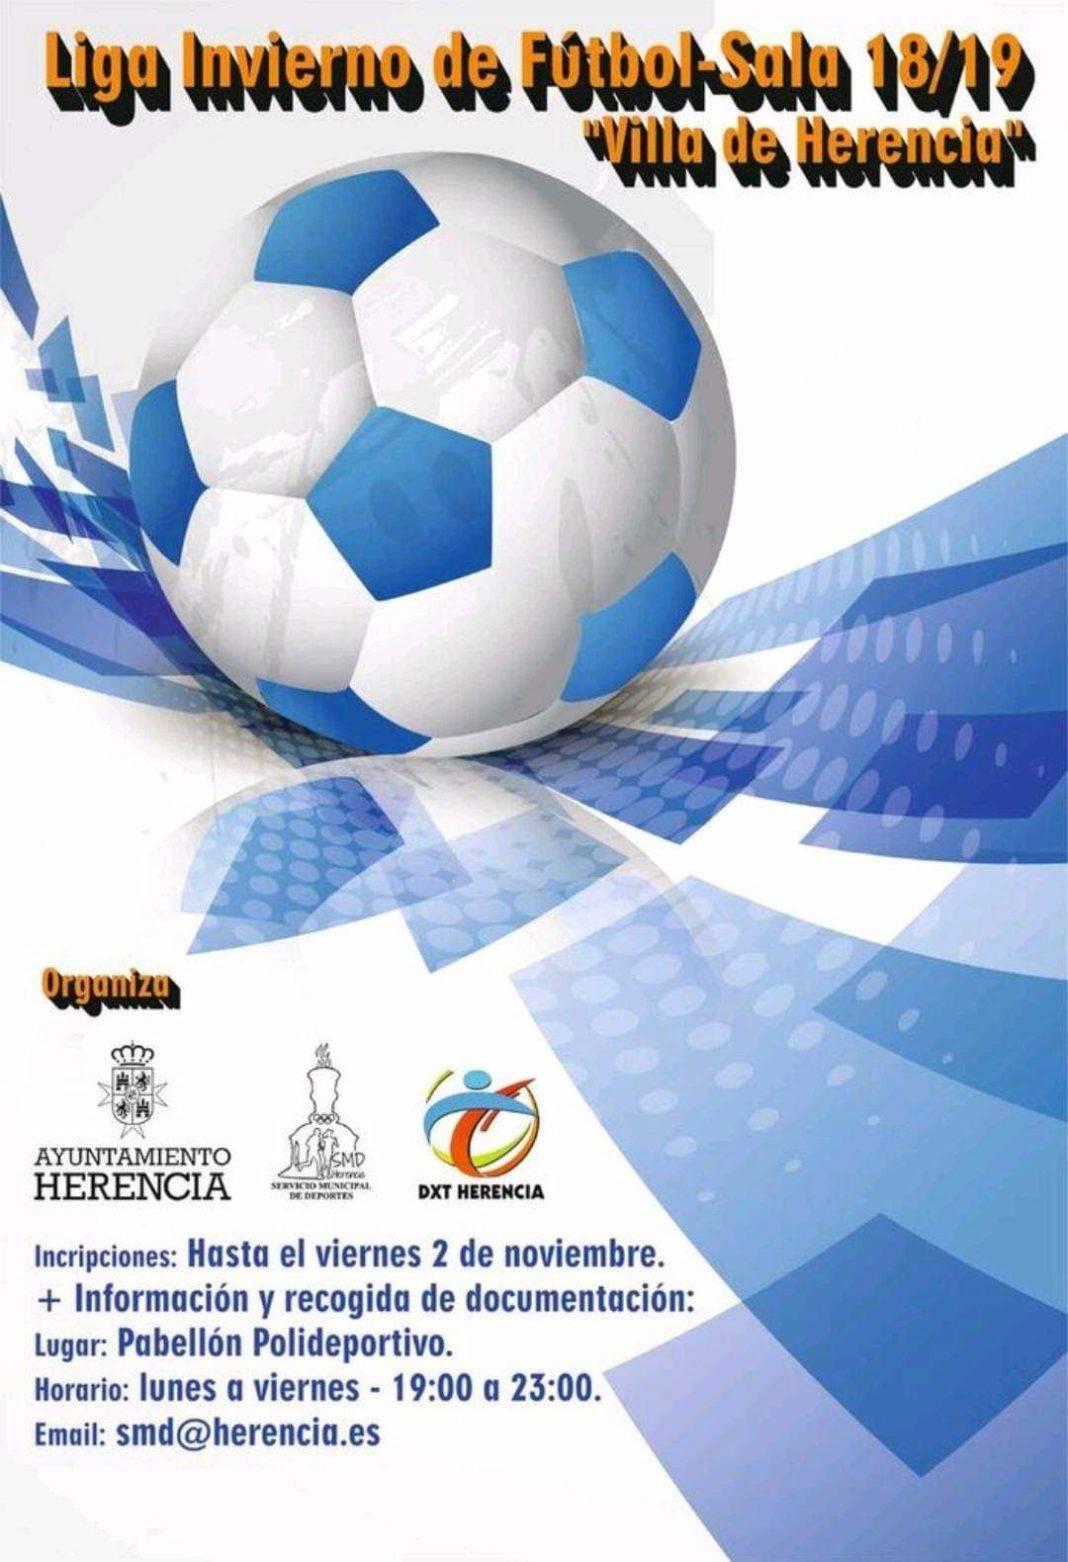 "liga invierno futbol sala herencia 2018 1068x1562 - Vuelve la Liga de Invierno de Fútbol Sala 2018-2019 ""Villa de Herencia"""